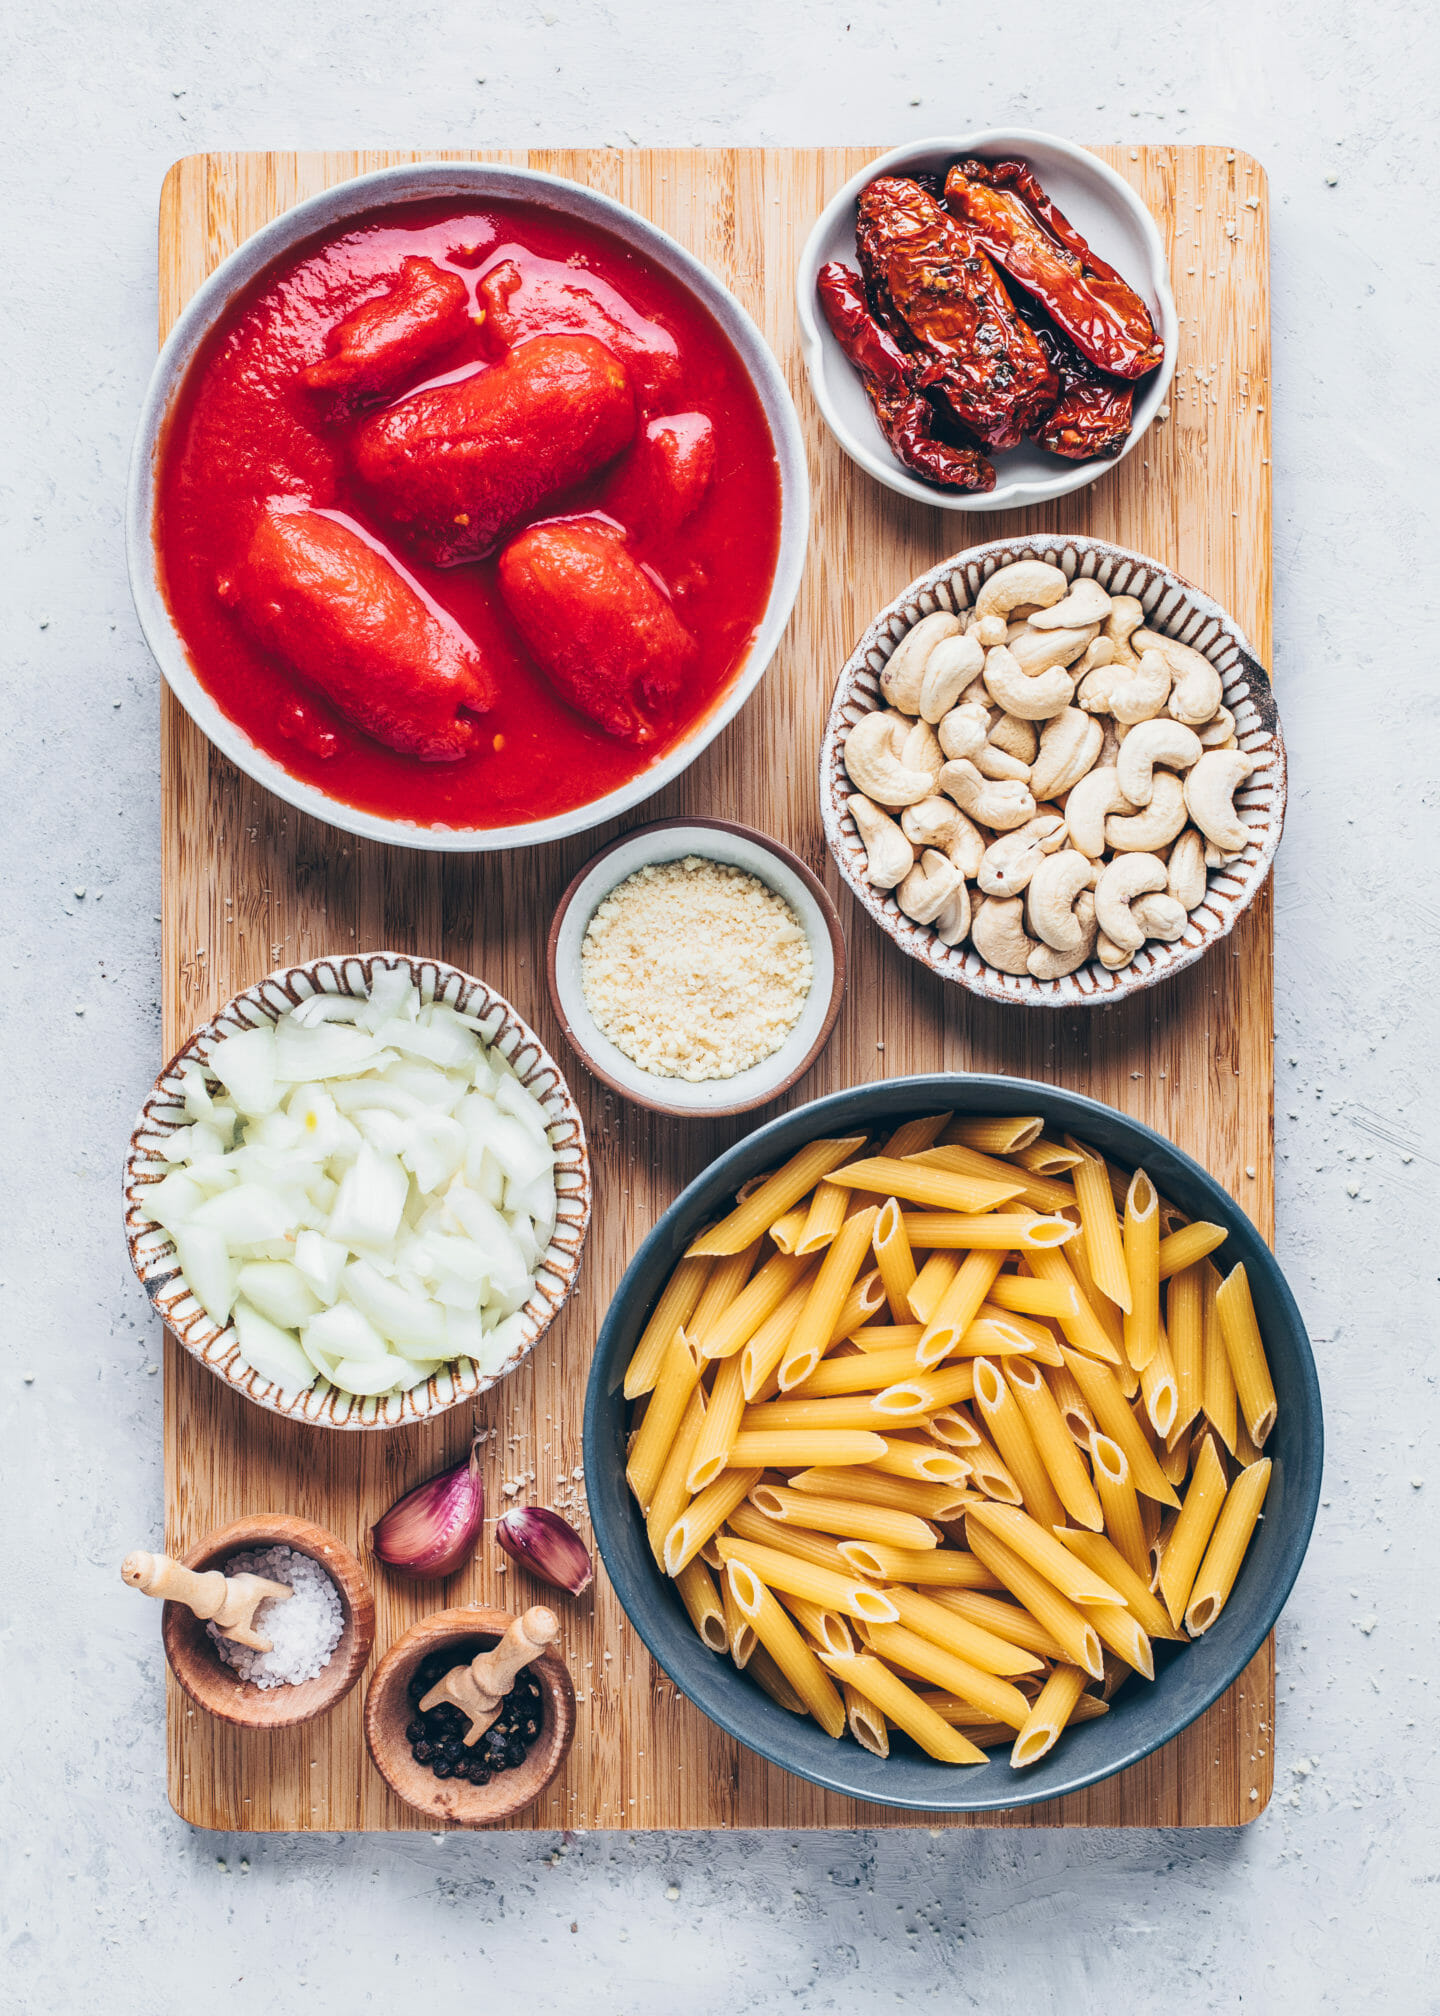 Ingredients for Vegan Tomato Cashew Cream Pasta